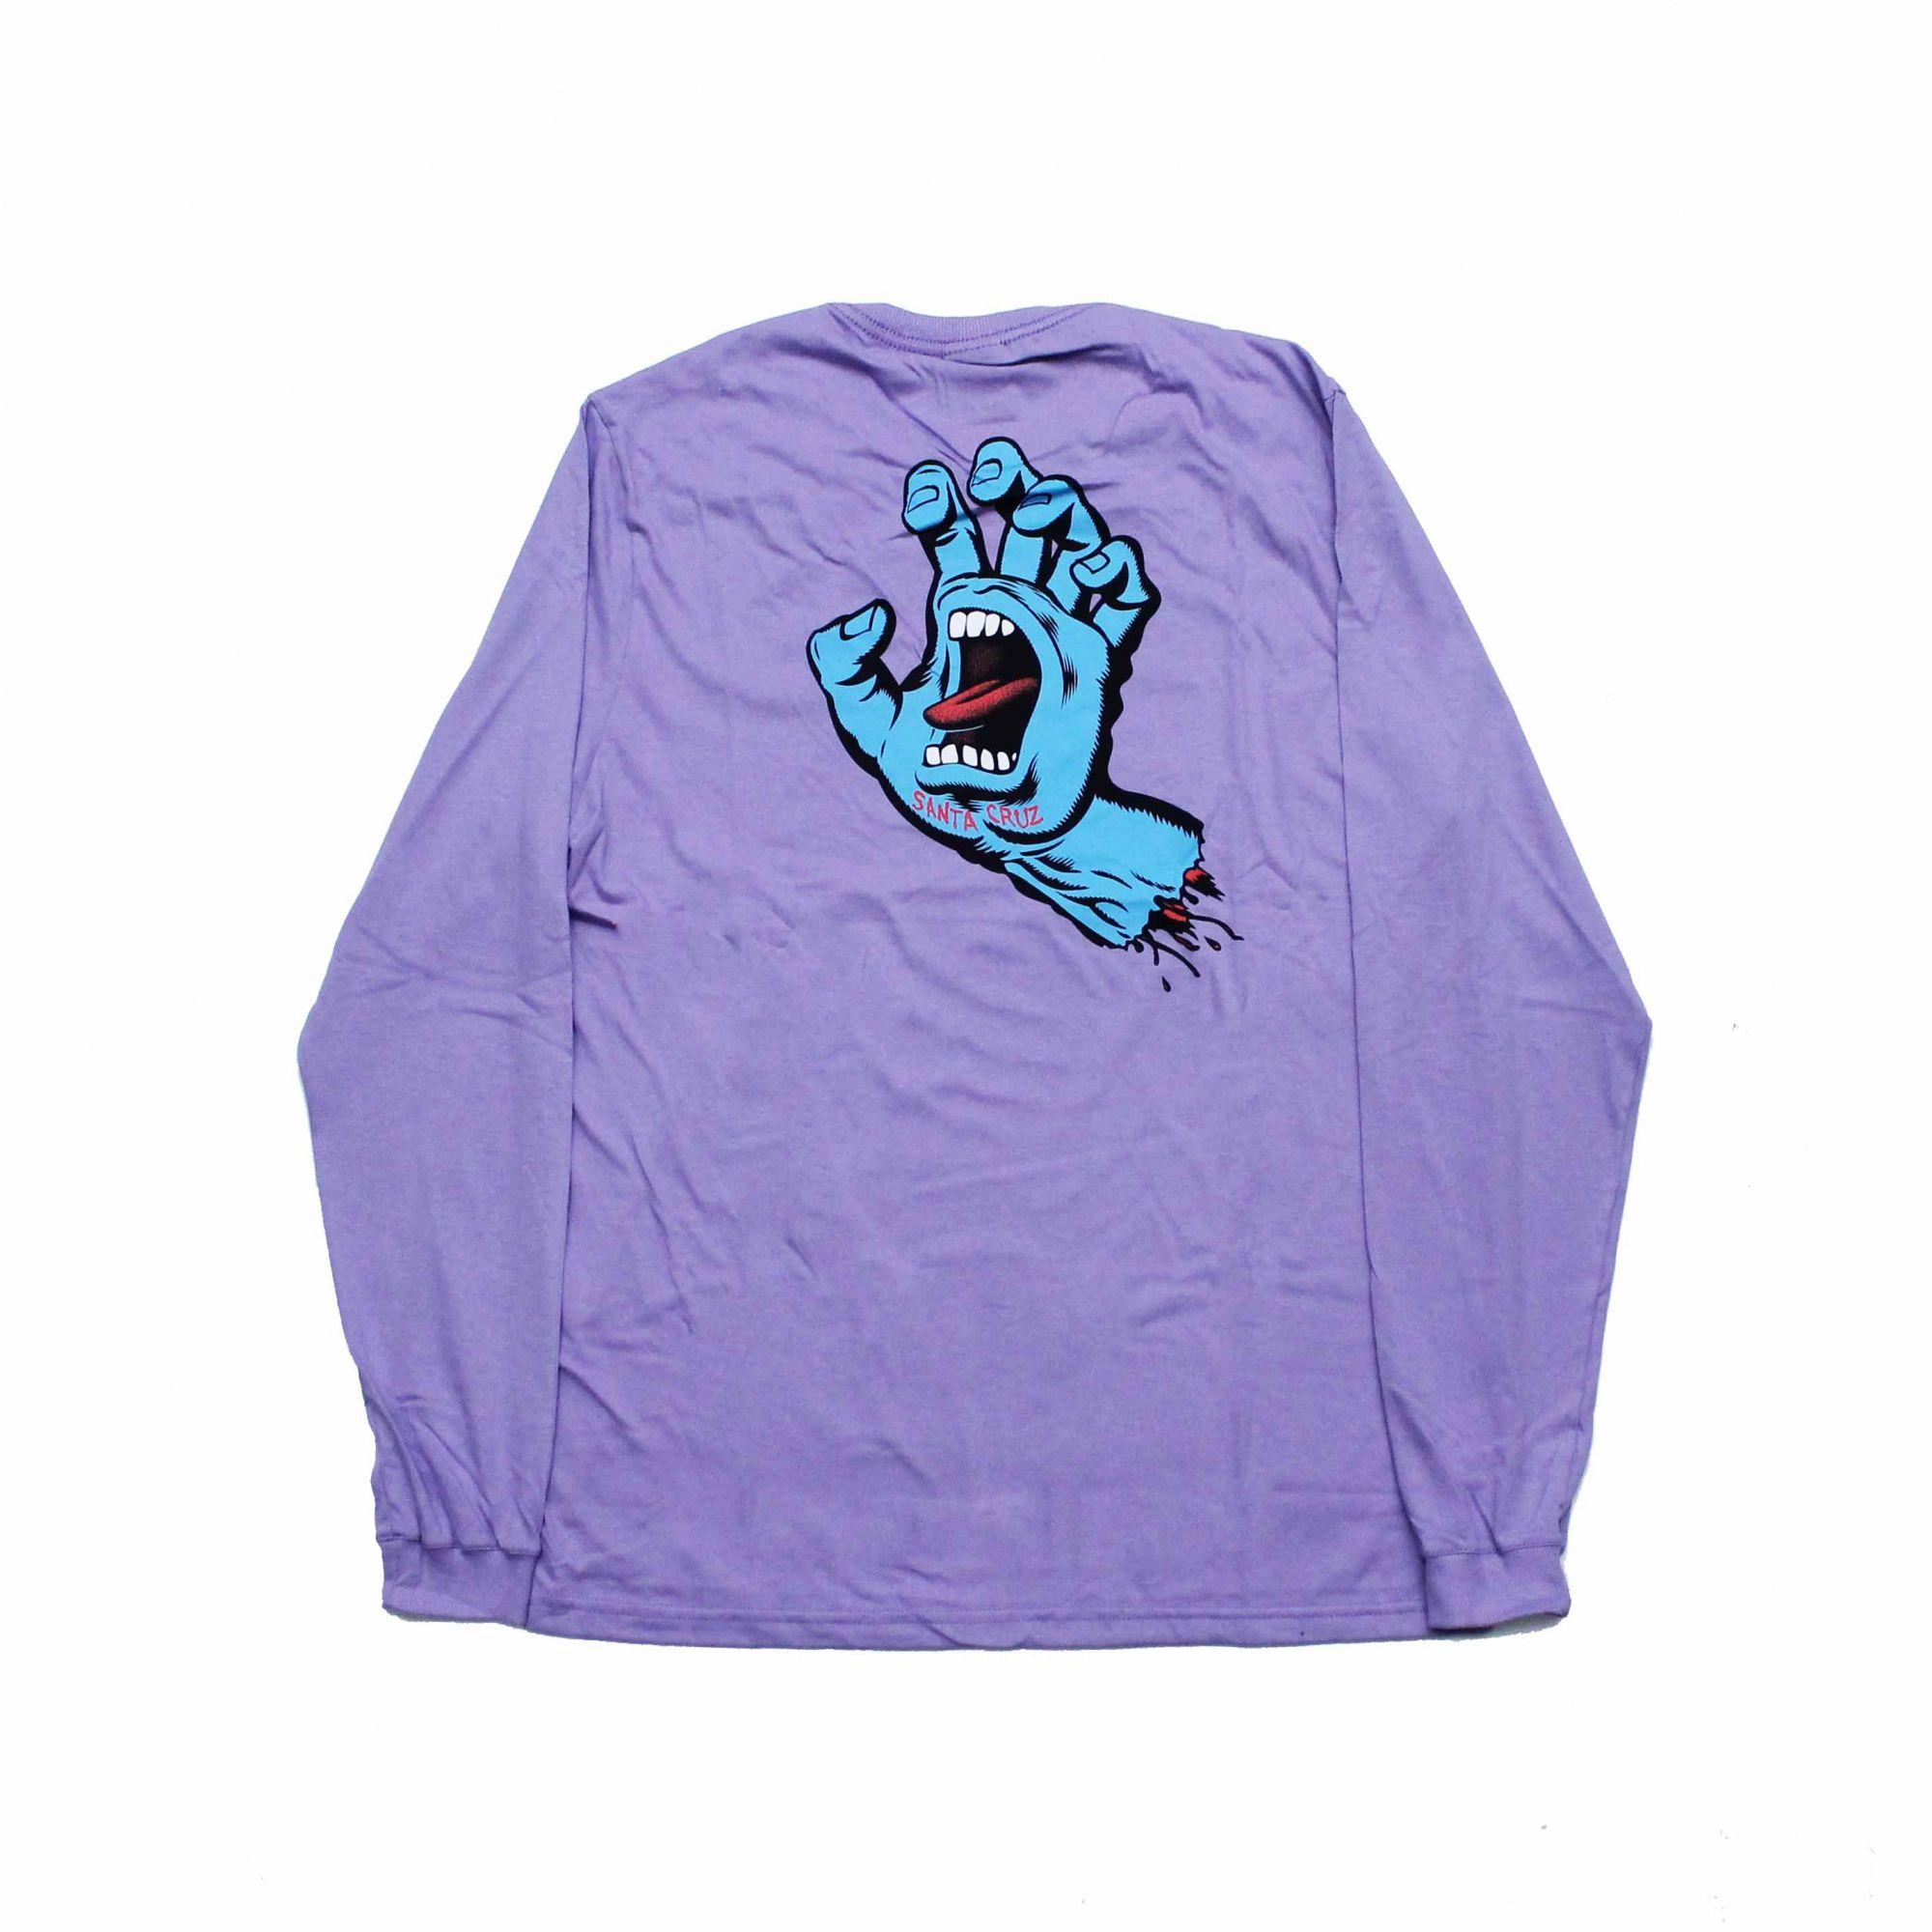 Camiseta Manga Longa Santa Cruz Frontandback Screaming Hand Lilás